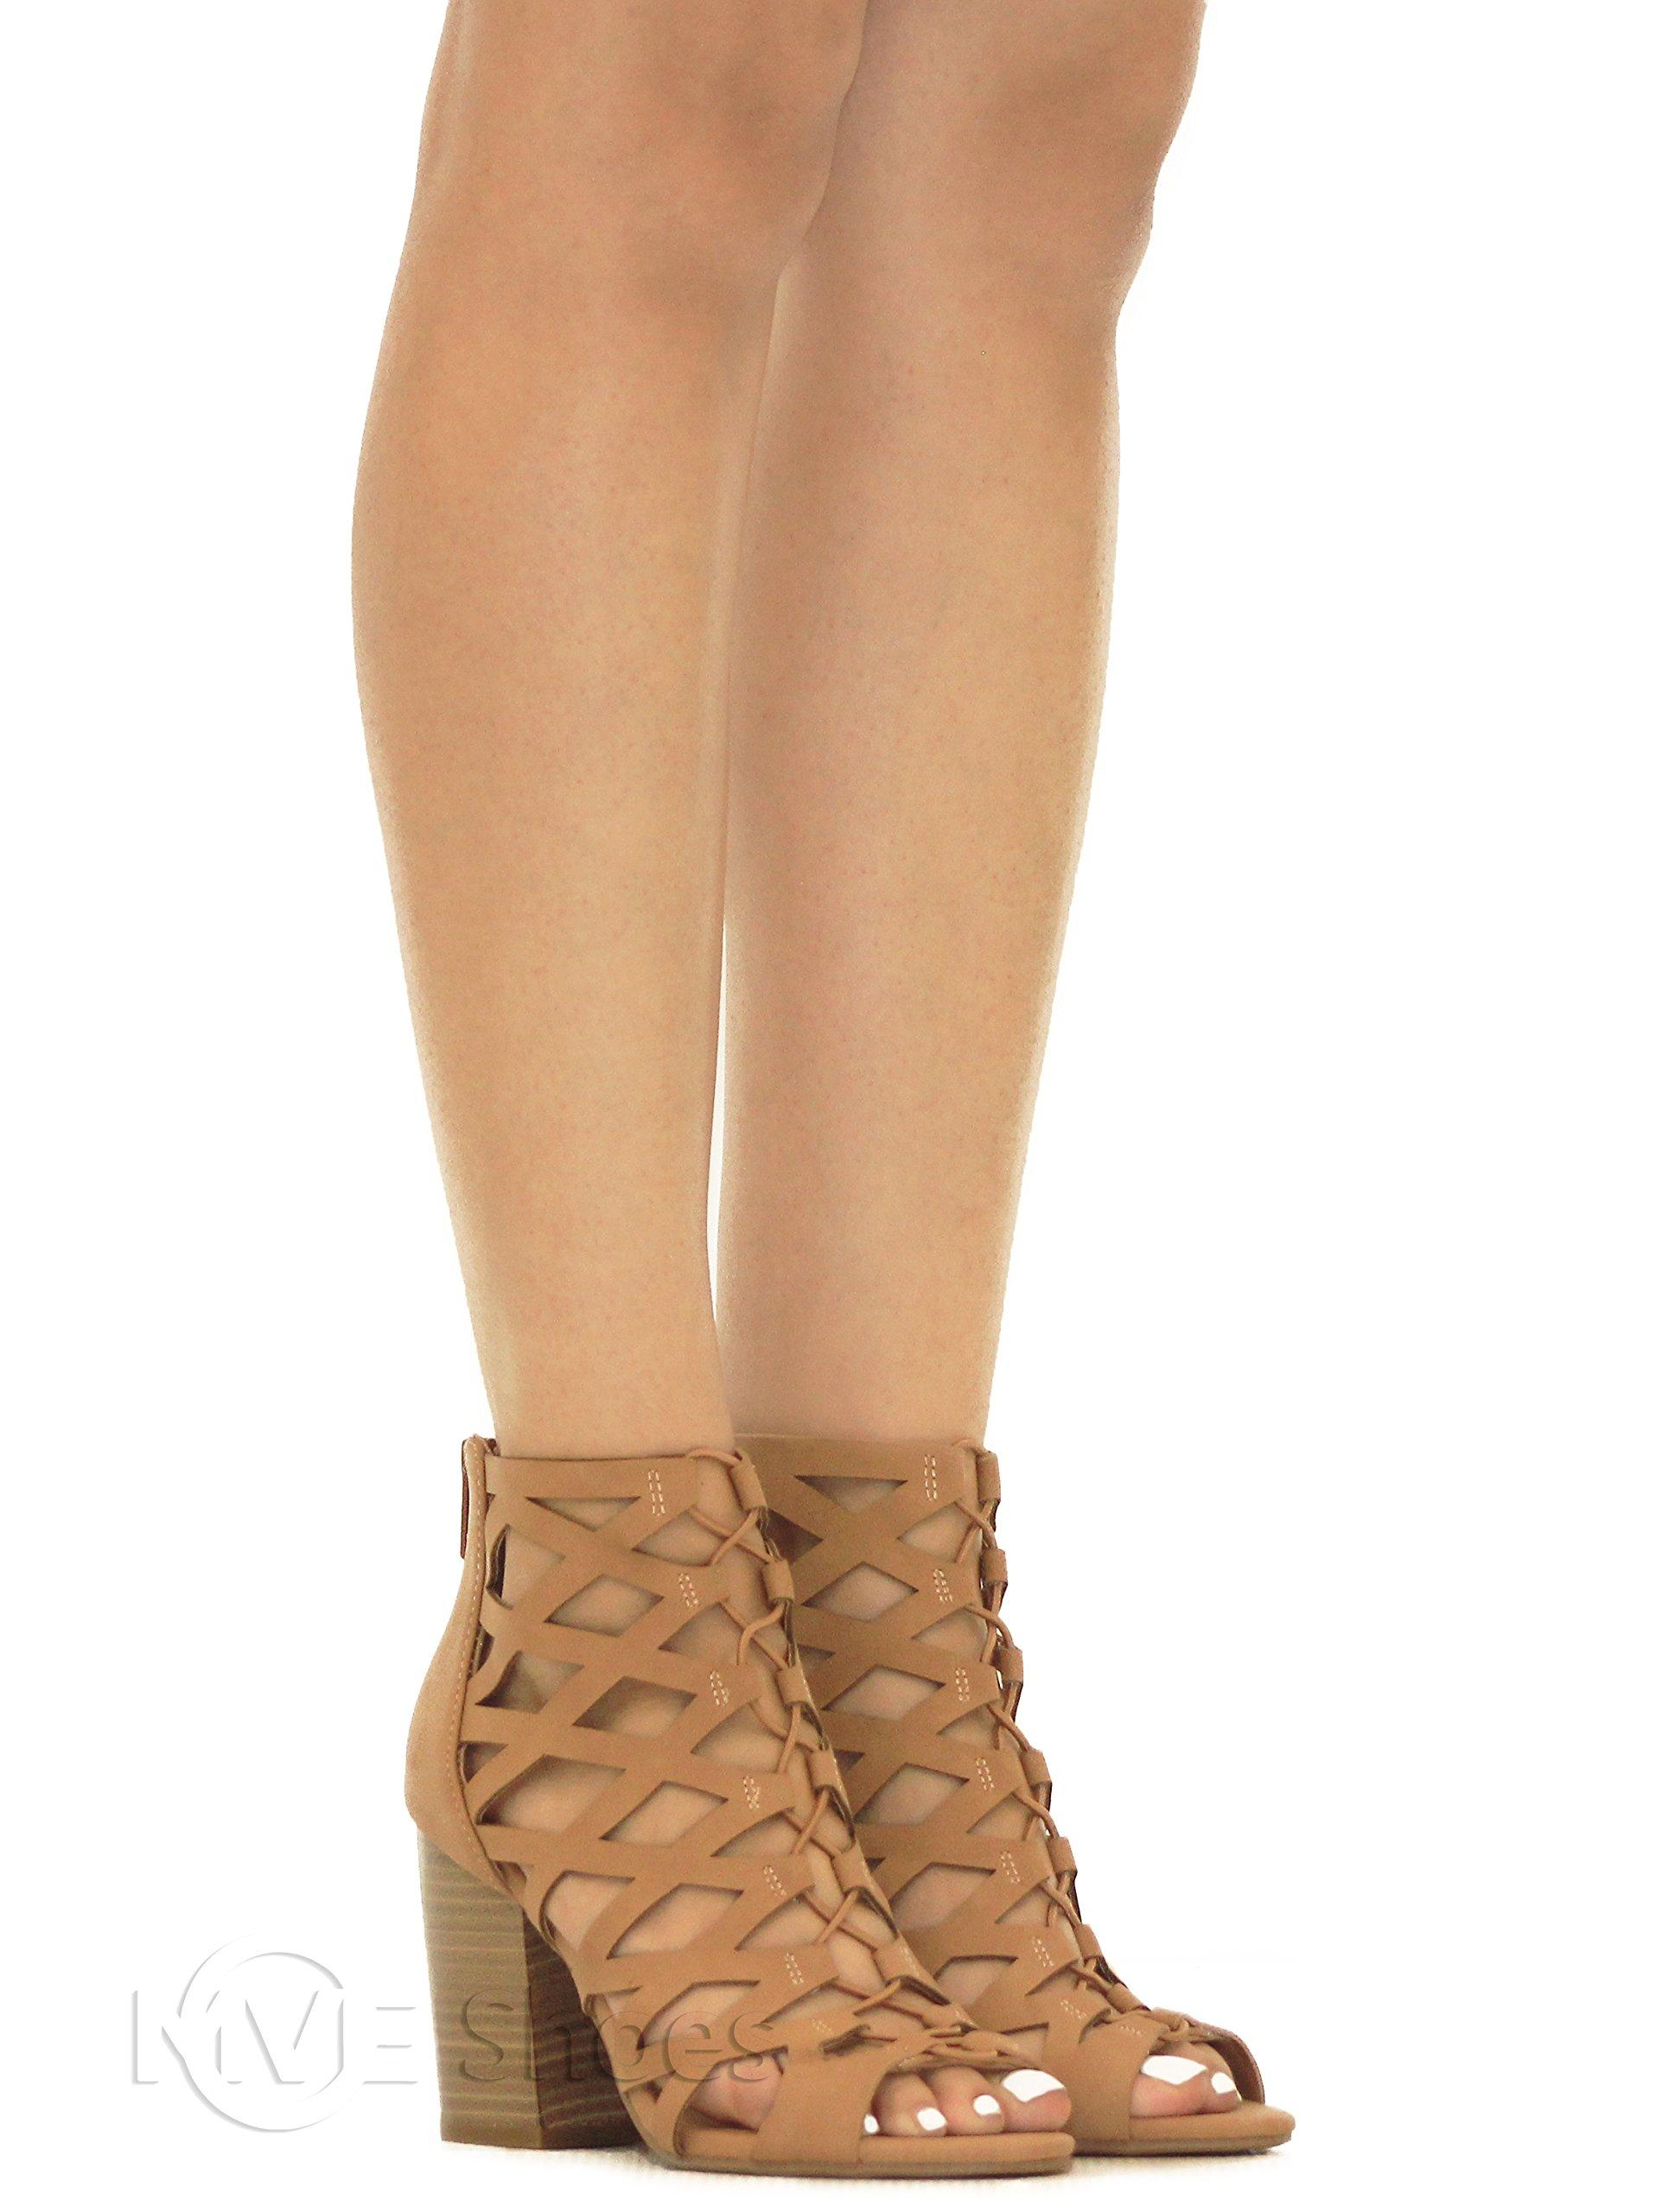 MVE Shoes Women's Open Toe Strappy Back Zipper Chunky Heel, tan nb Size 10 by MVE Shoes (Image #5)